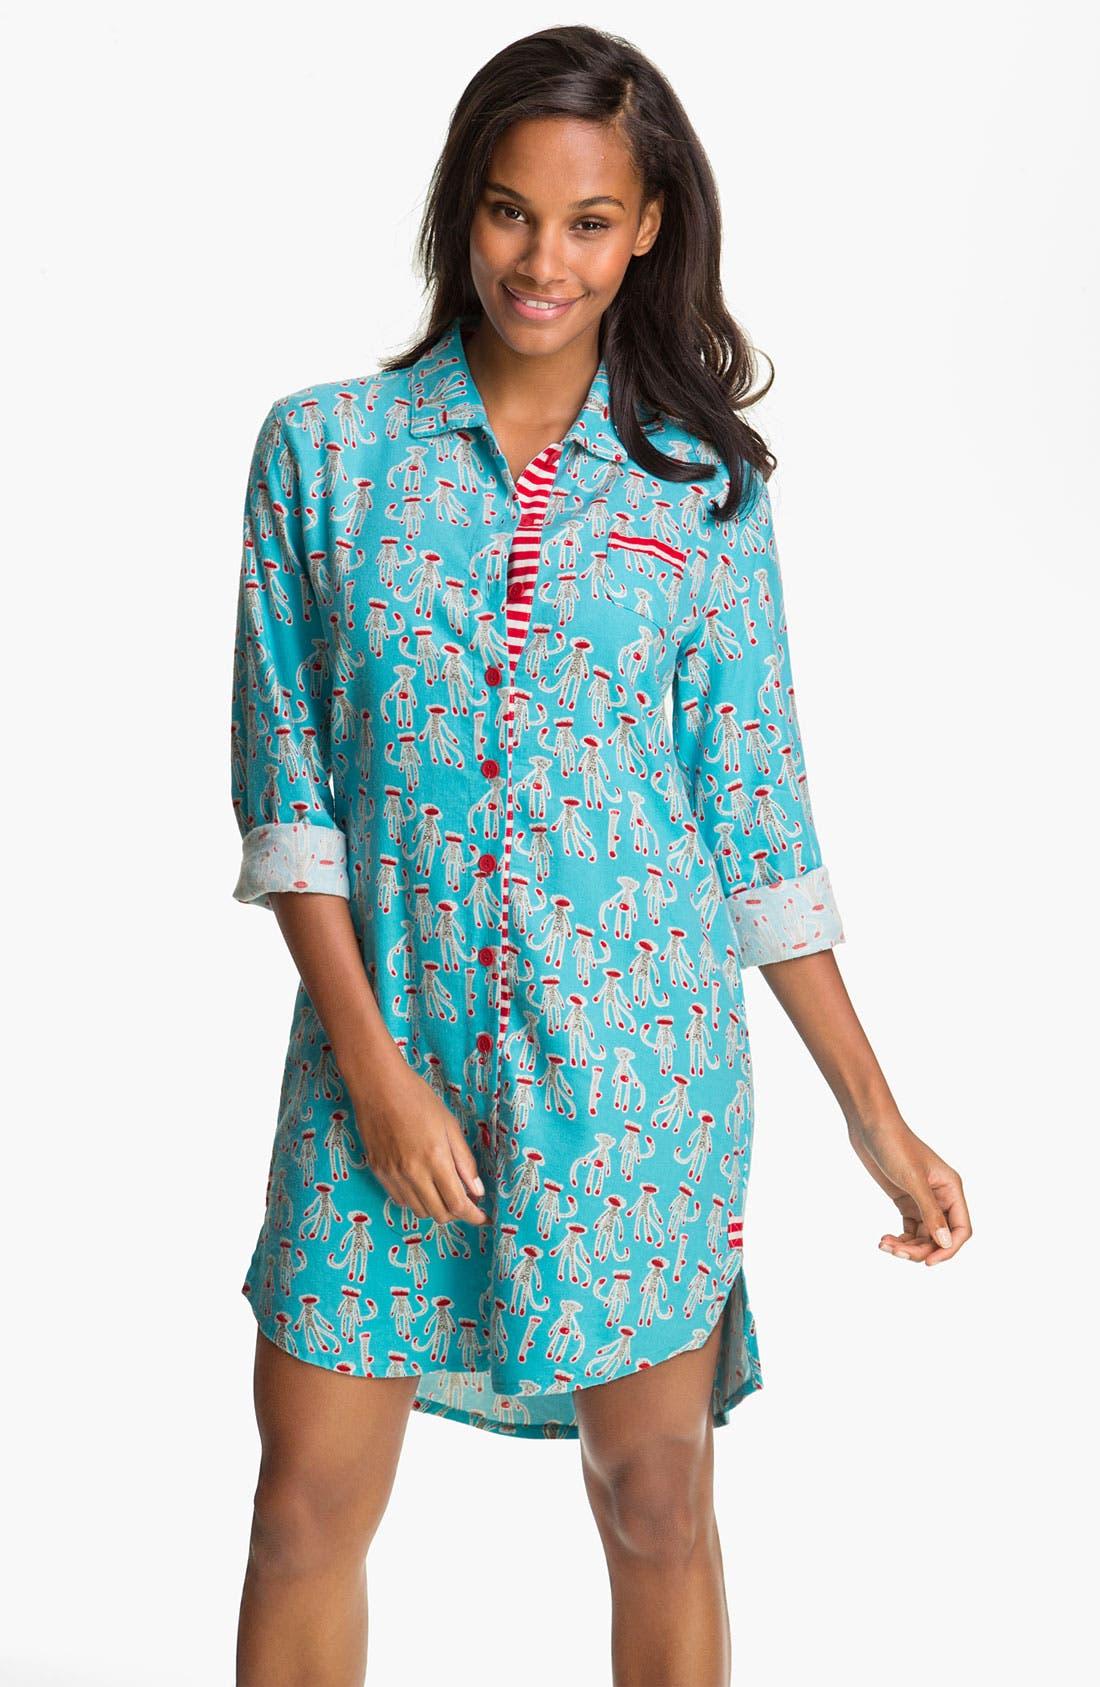 Alternate Image 1 Selected - Munki Munki Flannel Nightshirt